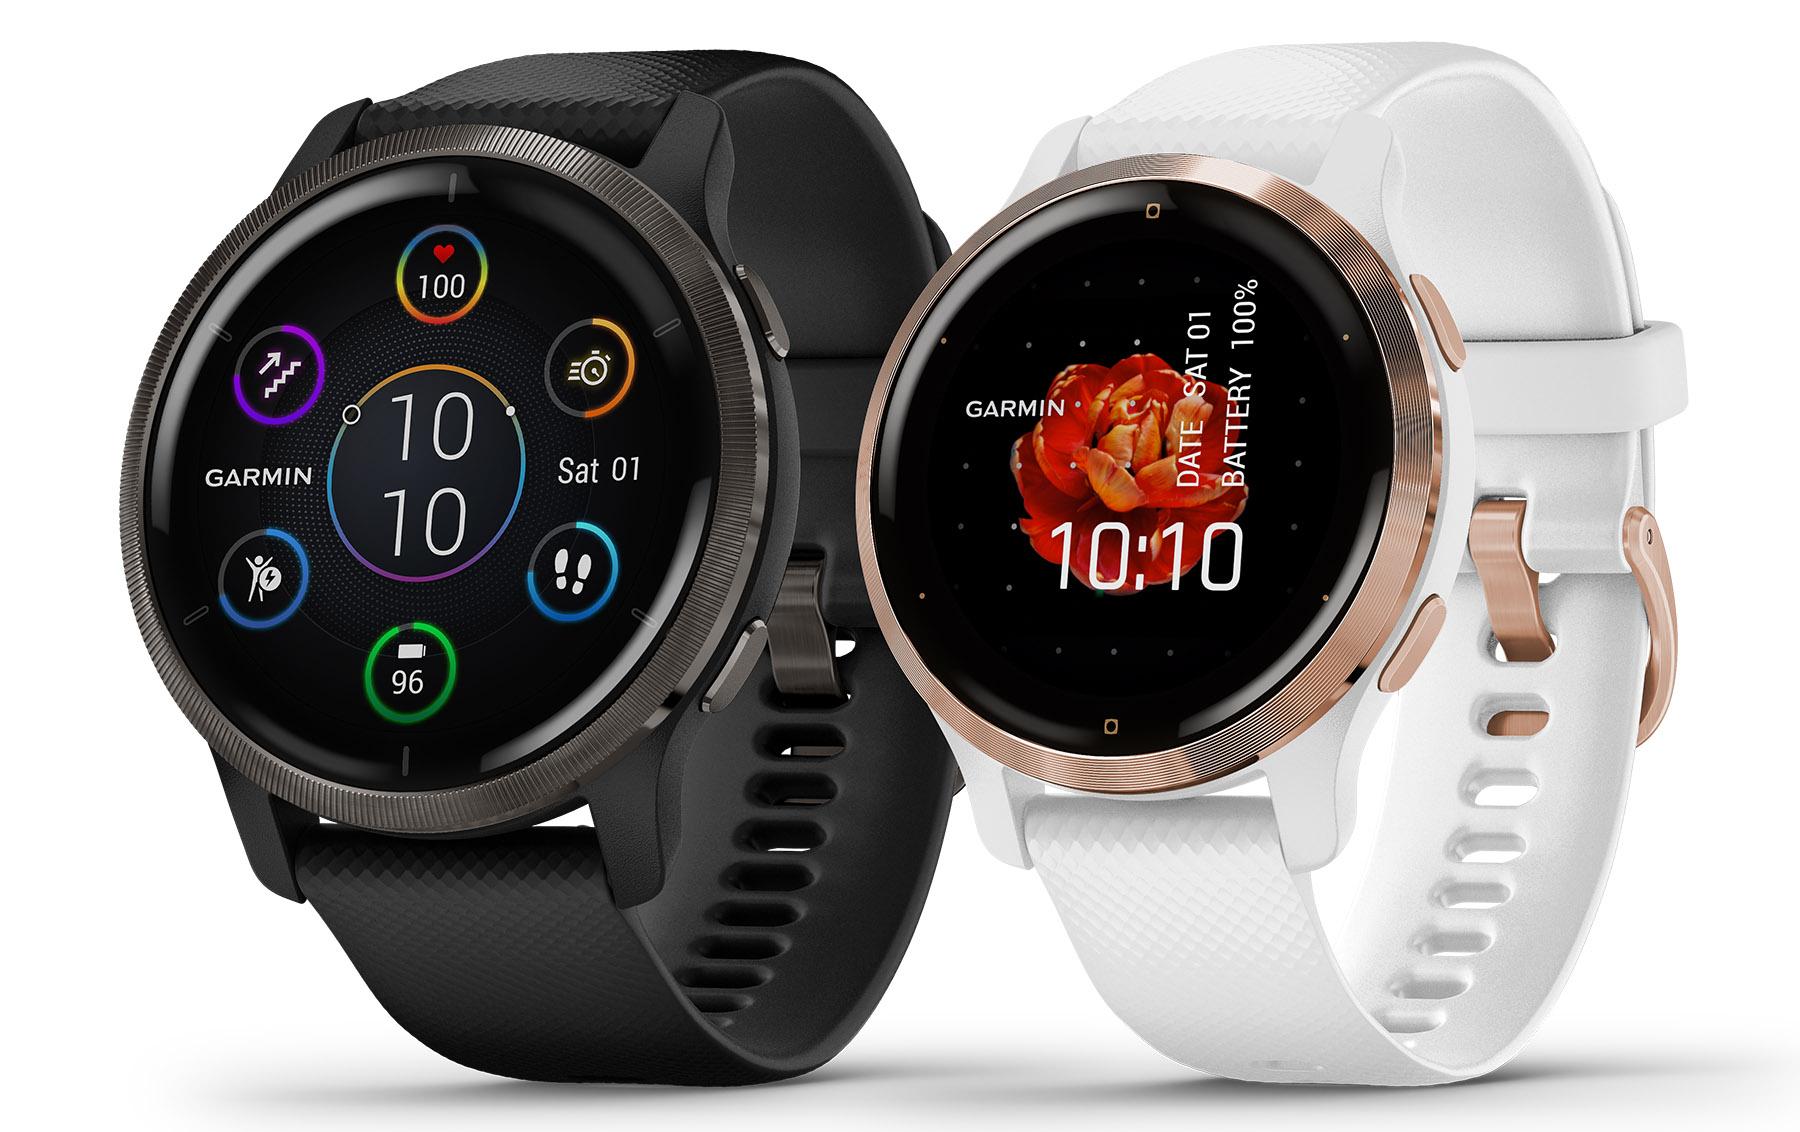 Garmin Venu 2 smartwatches provide sleep scores and health snapshots